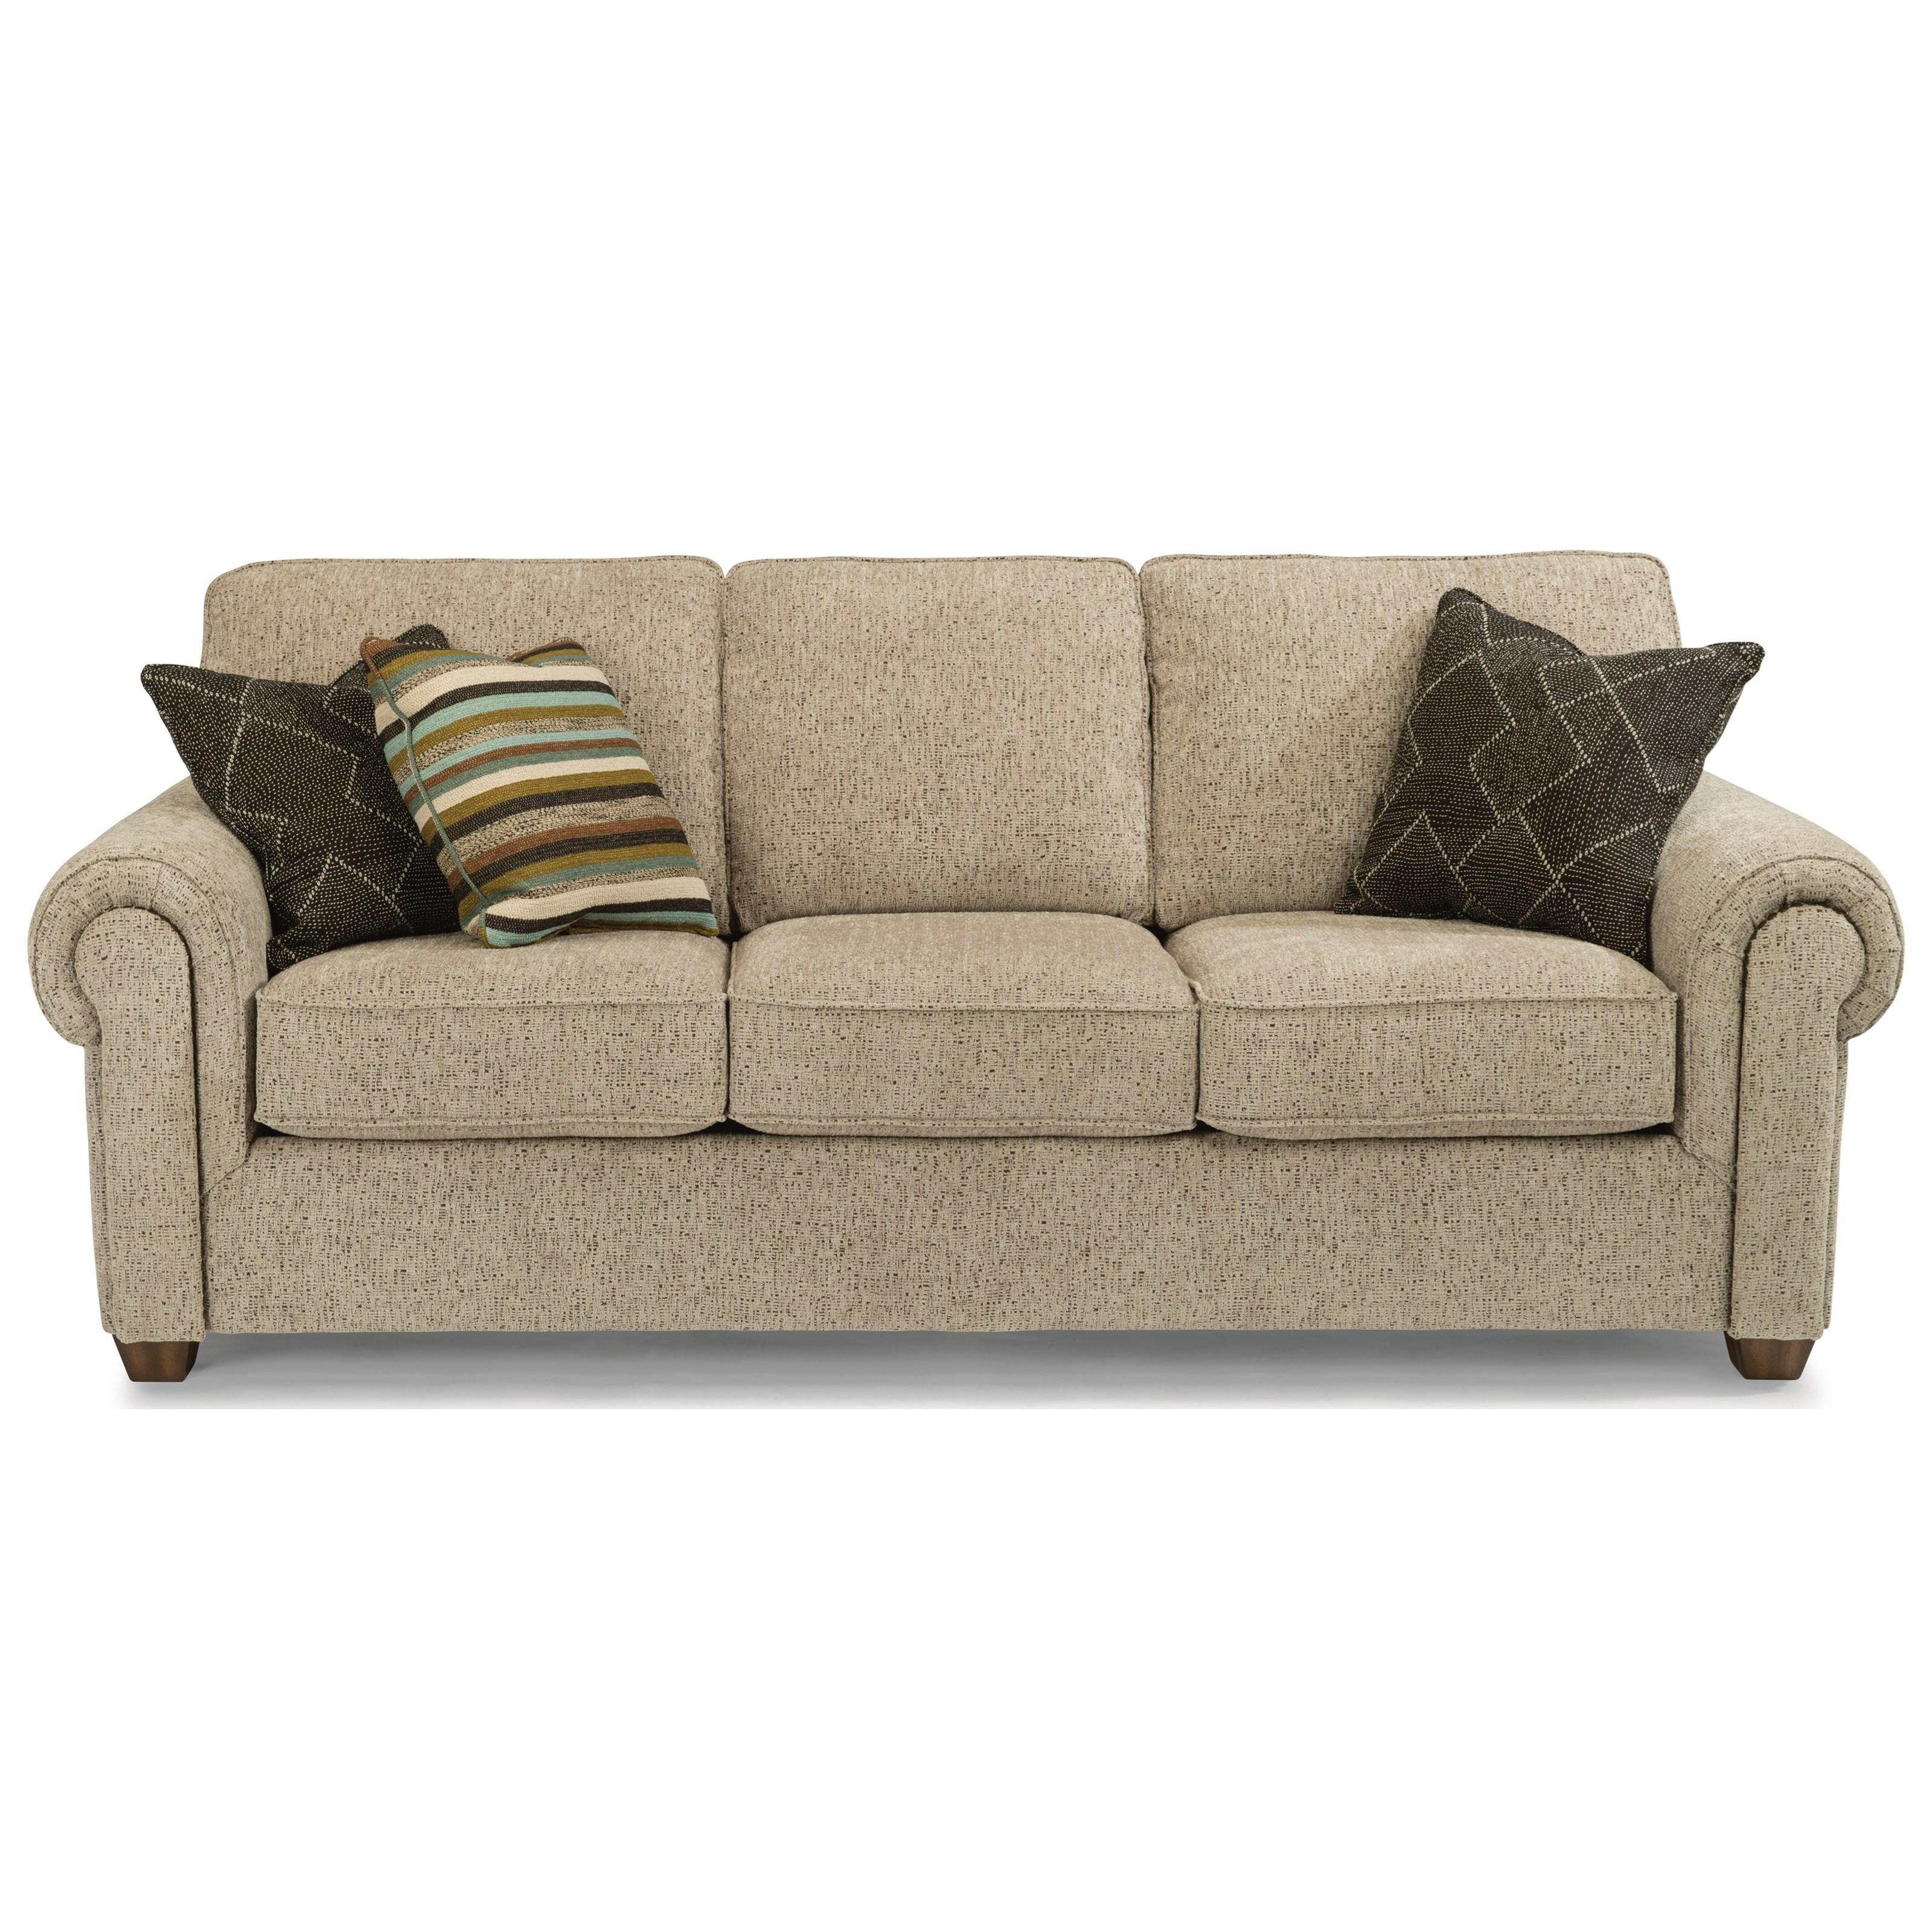 Flexsteel Carson Customizable Sofa With Rolled Arms   John V Schultz  Furniture   Sofas